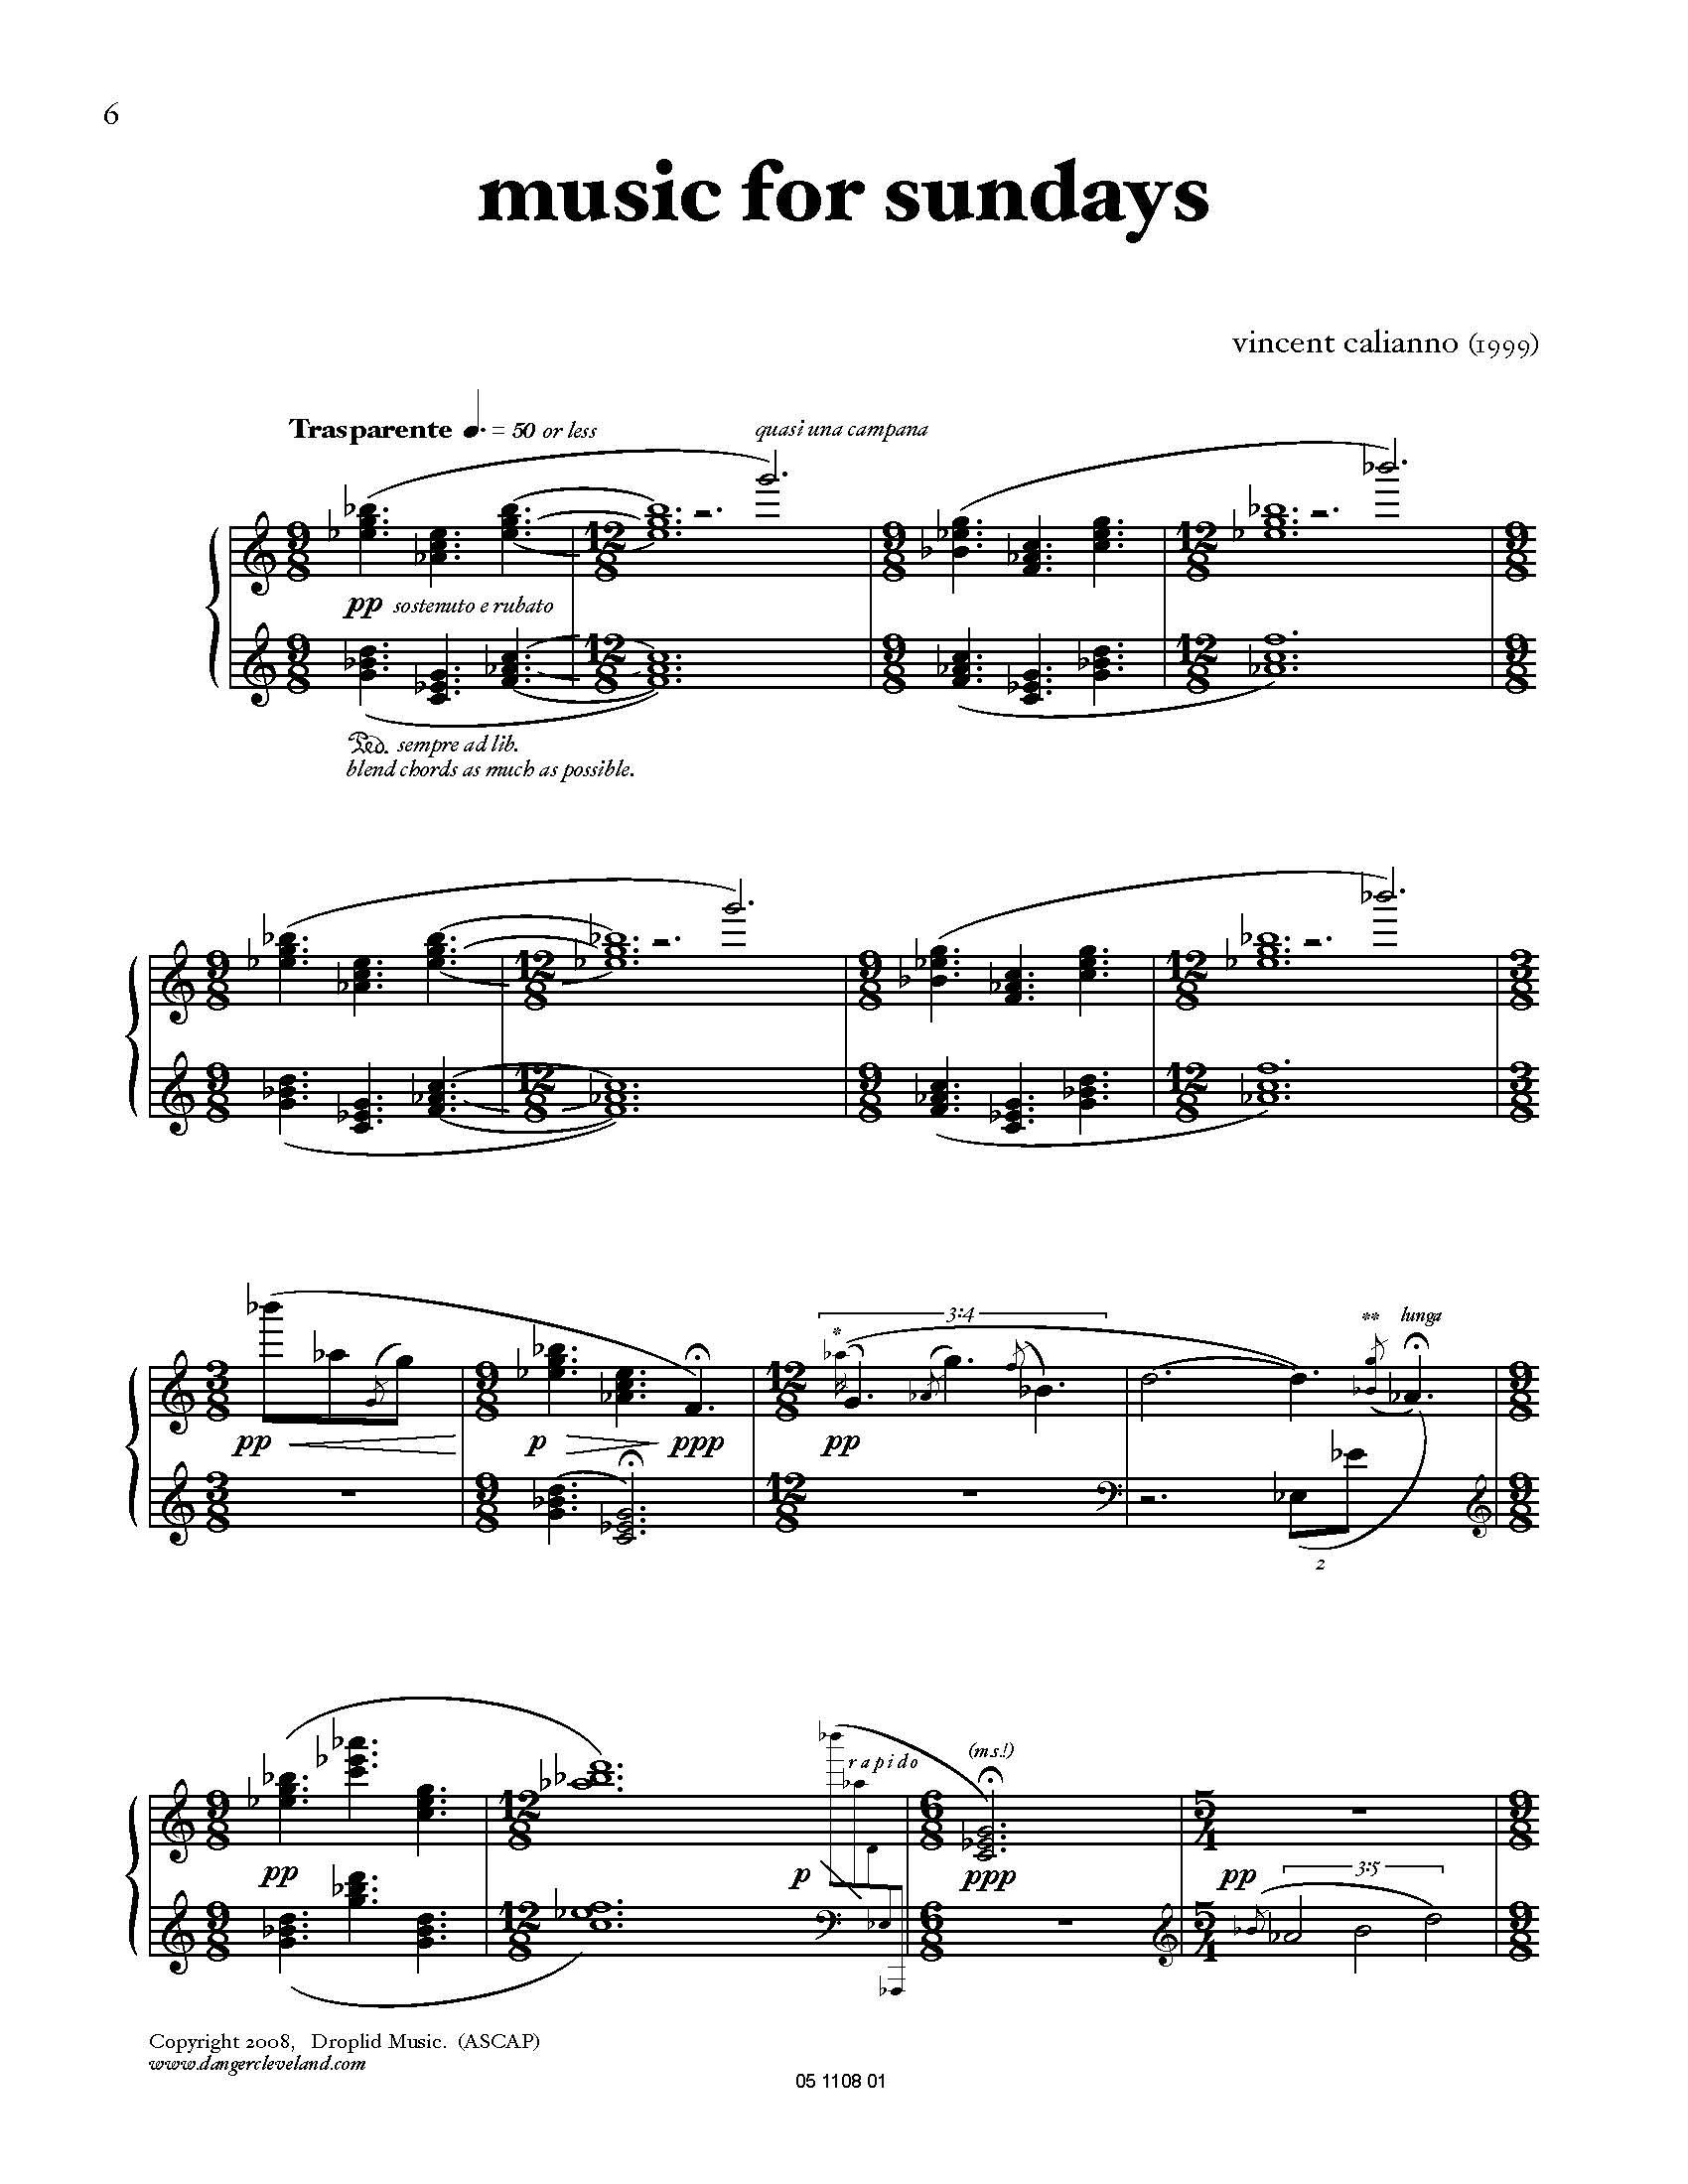 005-X1 Piano Pieces_Page_12.jpg